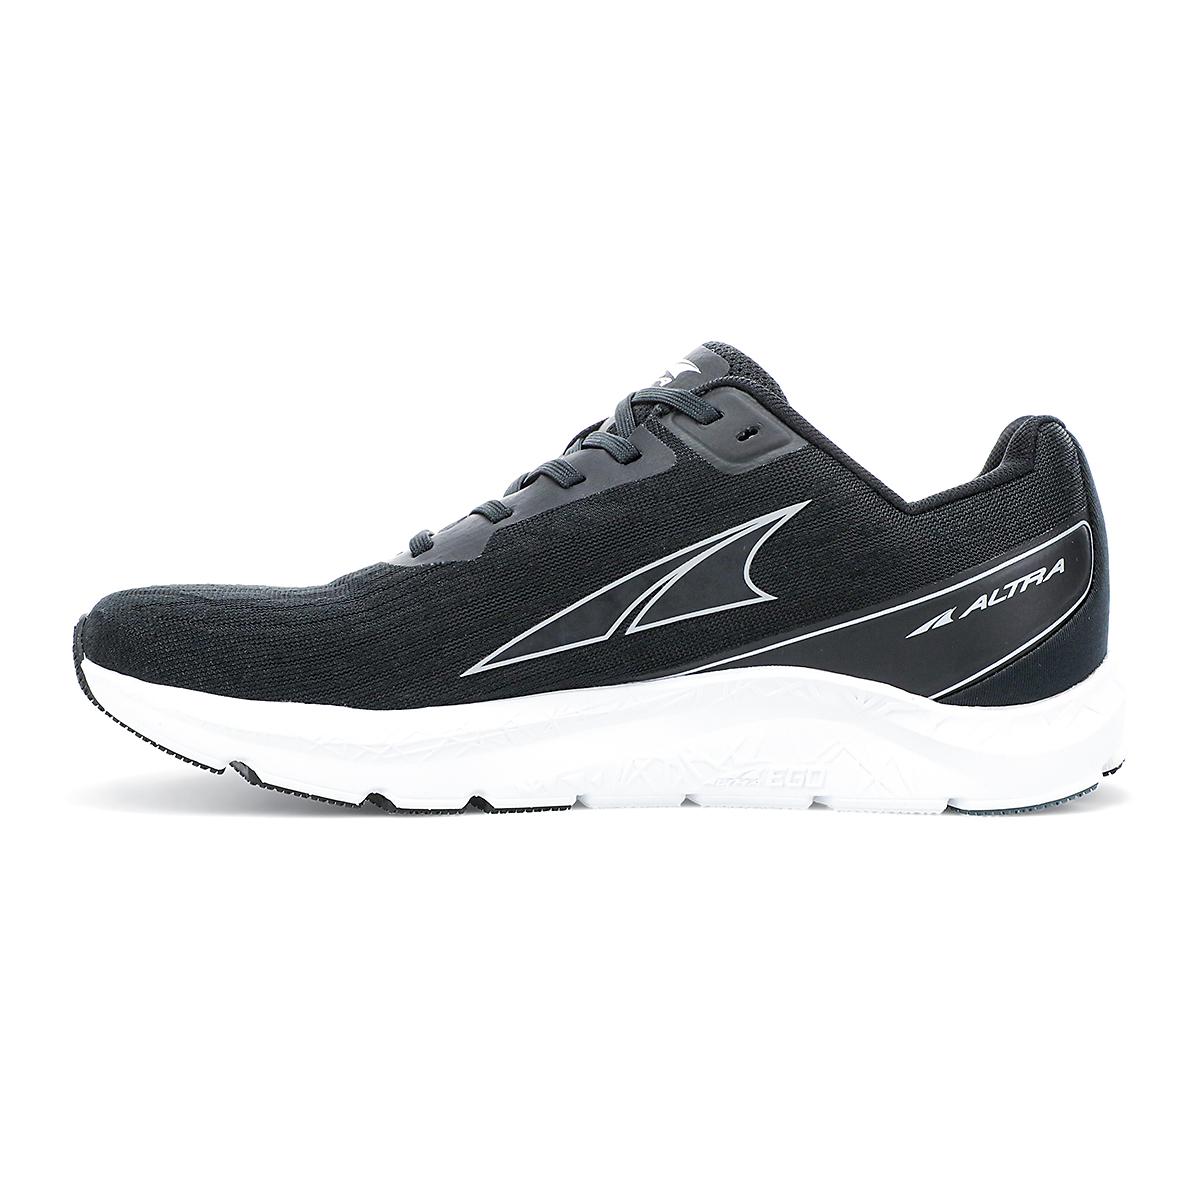 Women's Altra Rivera Running Shoe - Color: Black/White - Size: 5.5 - Width: Regular, Black/White, large, image 2